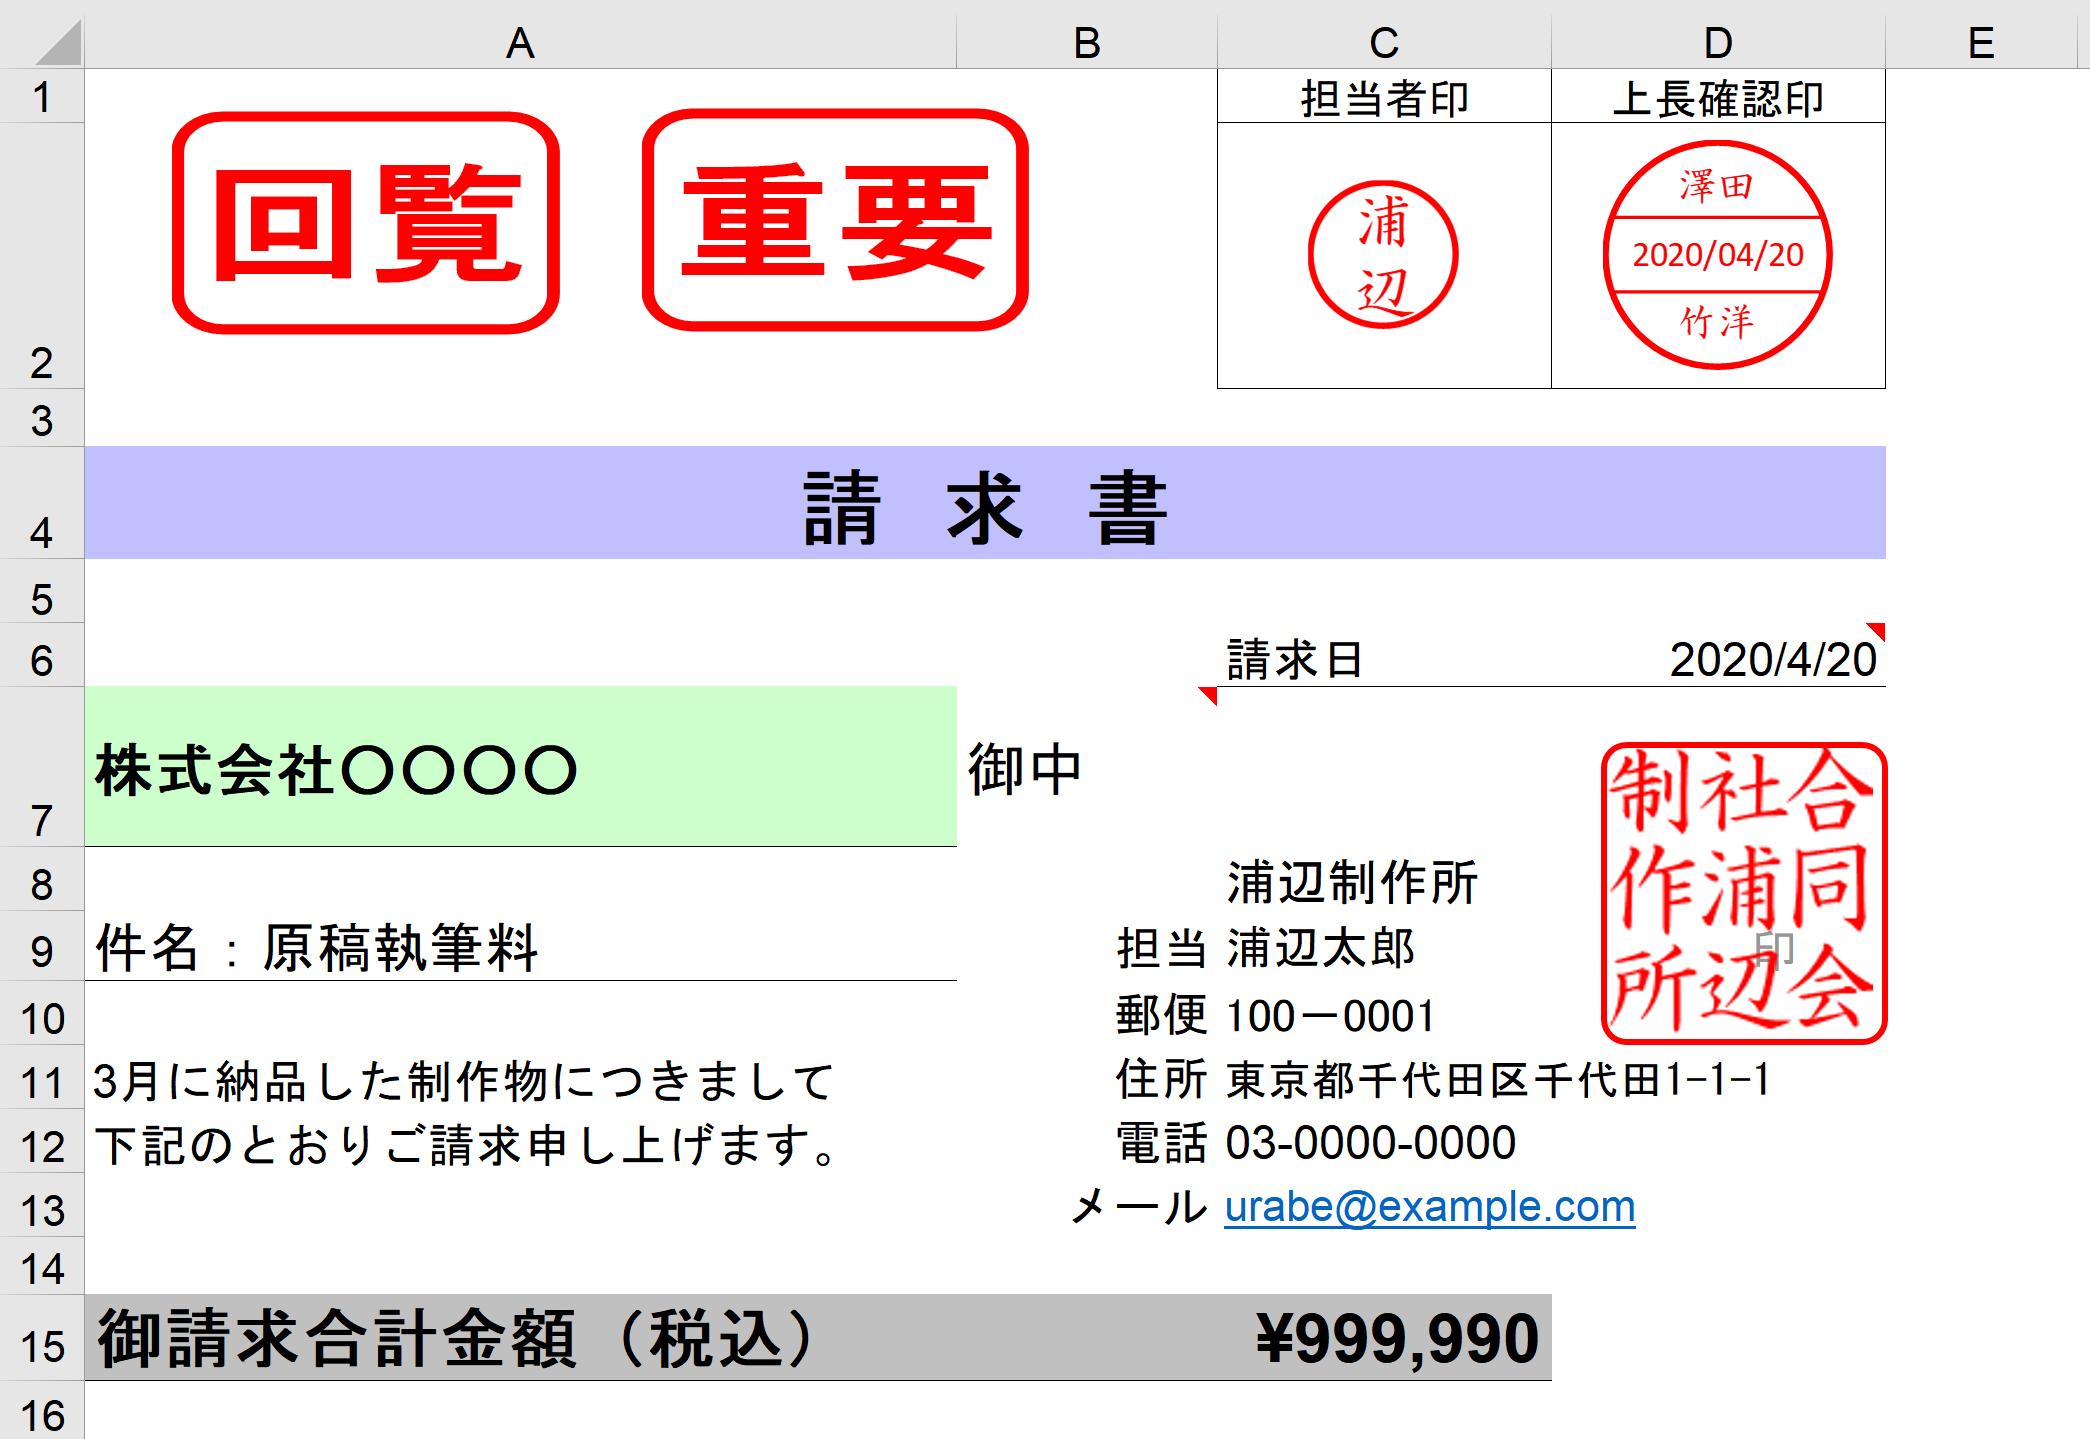 「Excel電子印鑑」